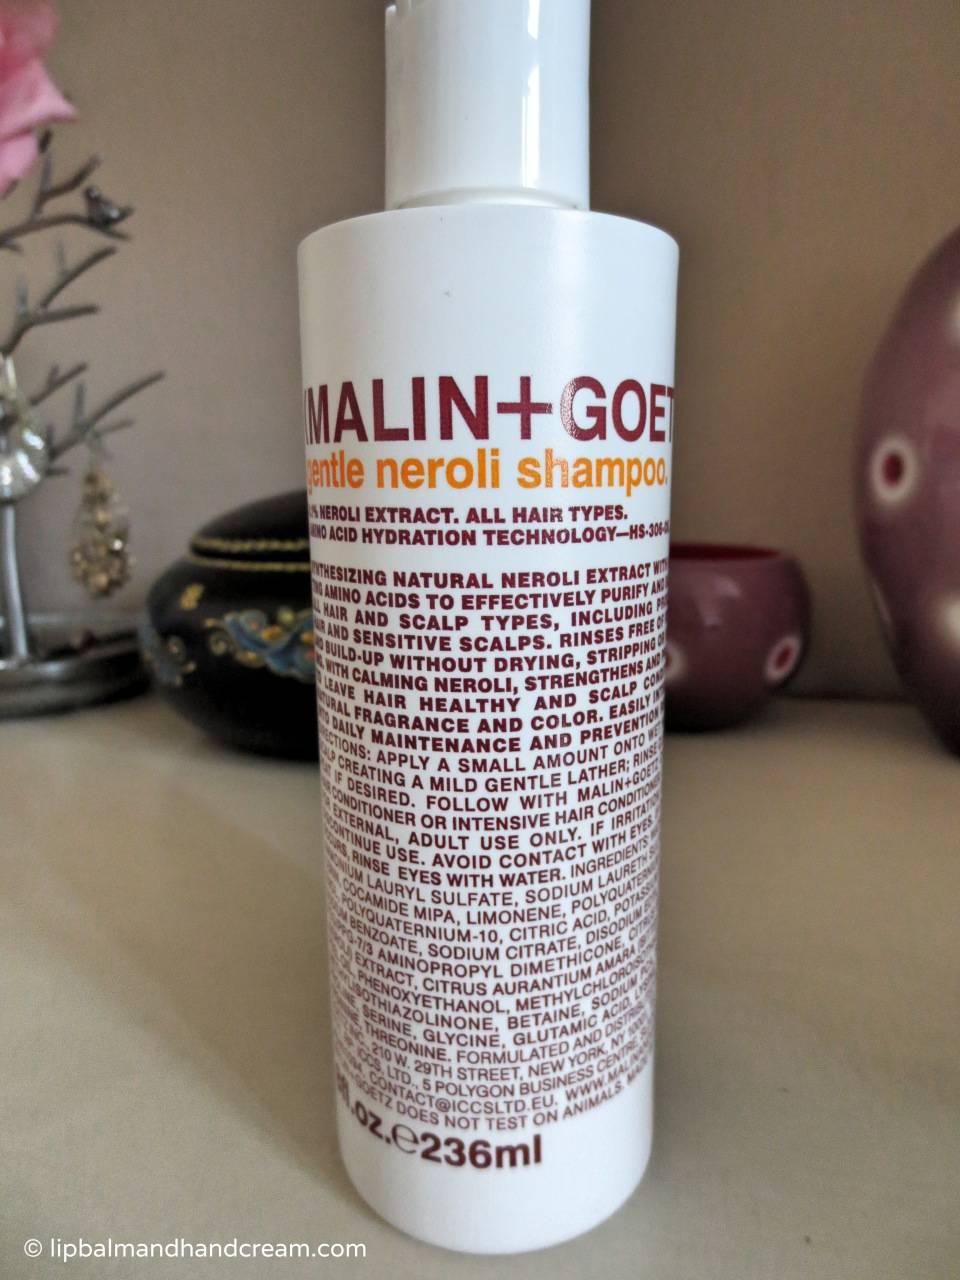 Malin + Goetz gentle neroli shampoo